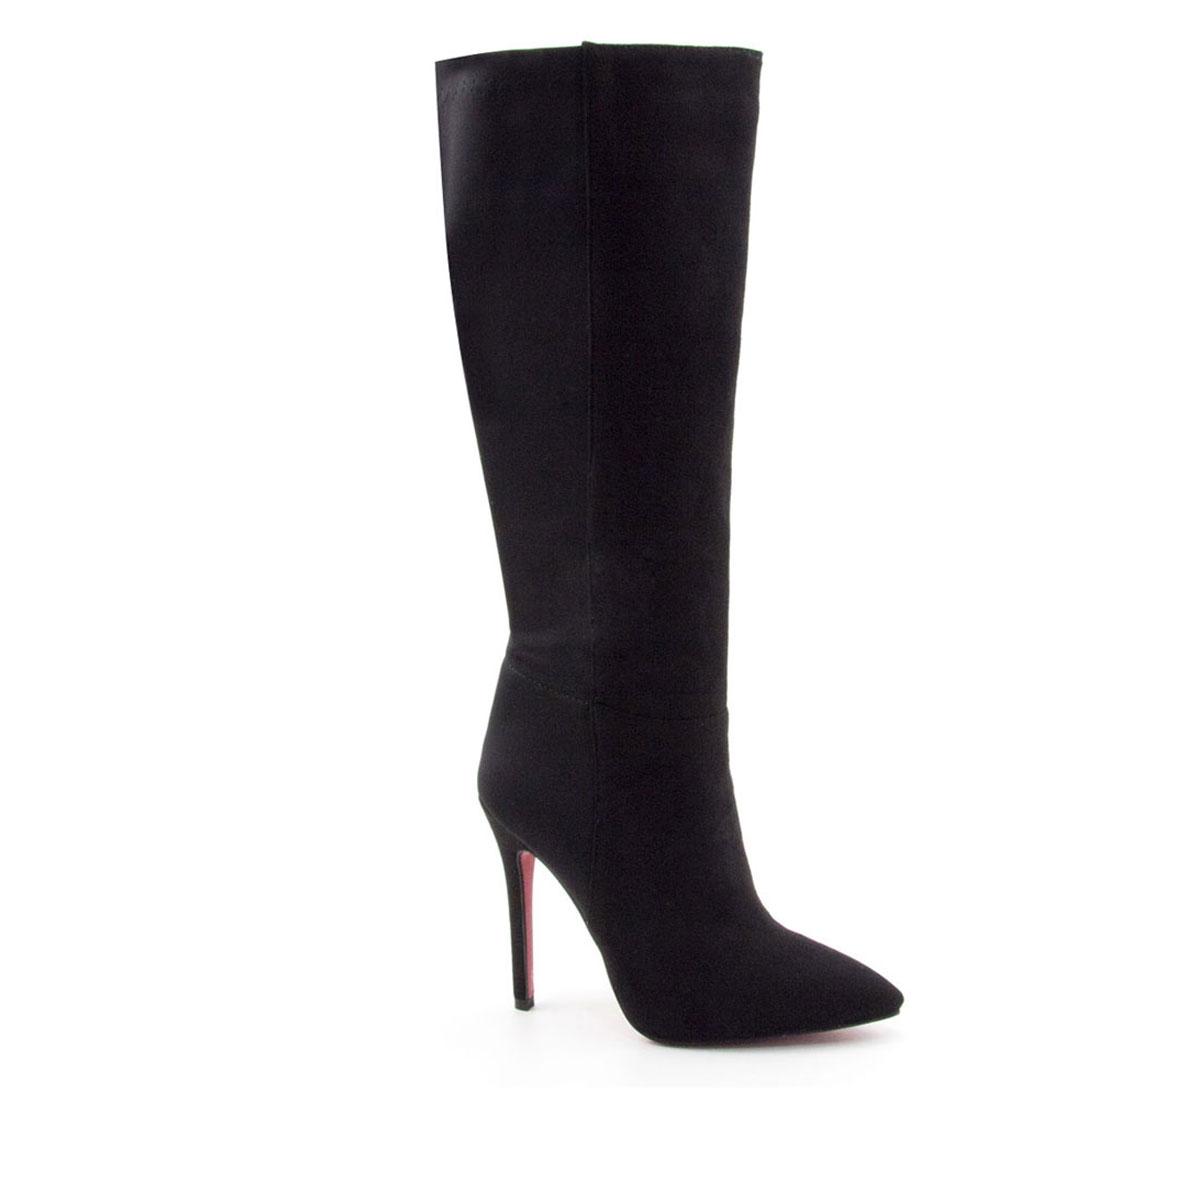 65b8a862a6c Γυναικείες Μπότες Ψηλοτάκουνες Μαύρες - Remake - Glami.gr